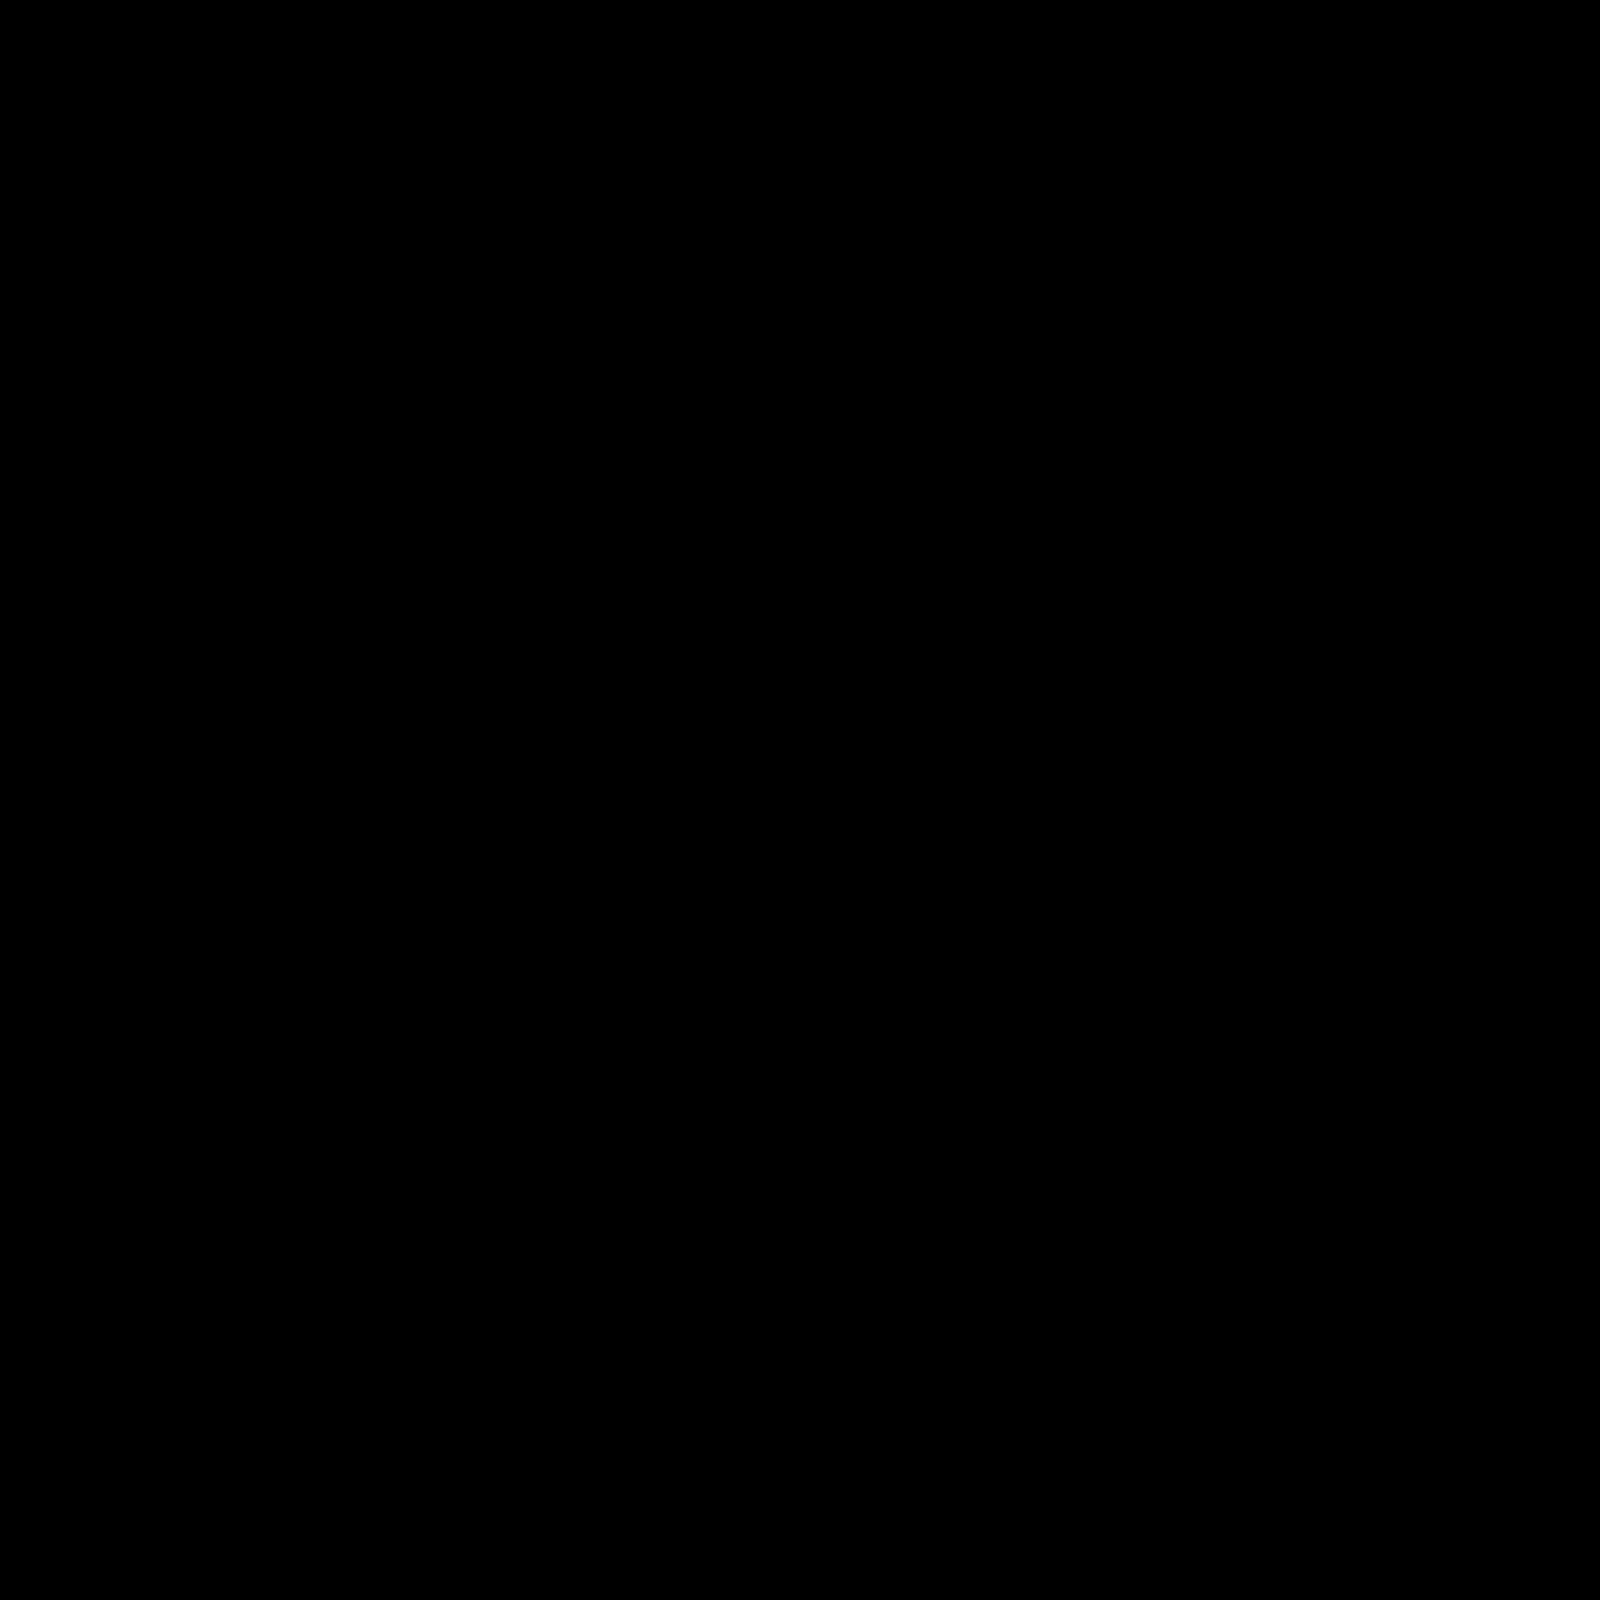 CNC Machine Filled icon